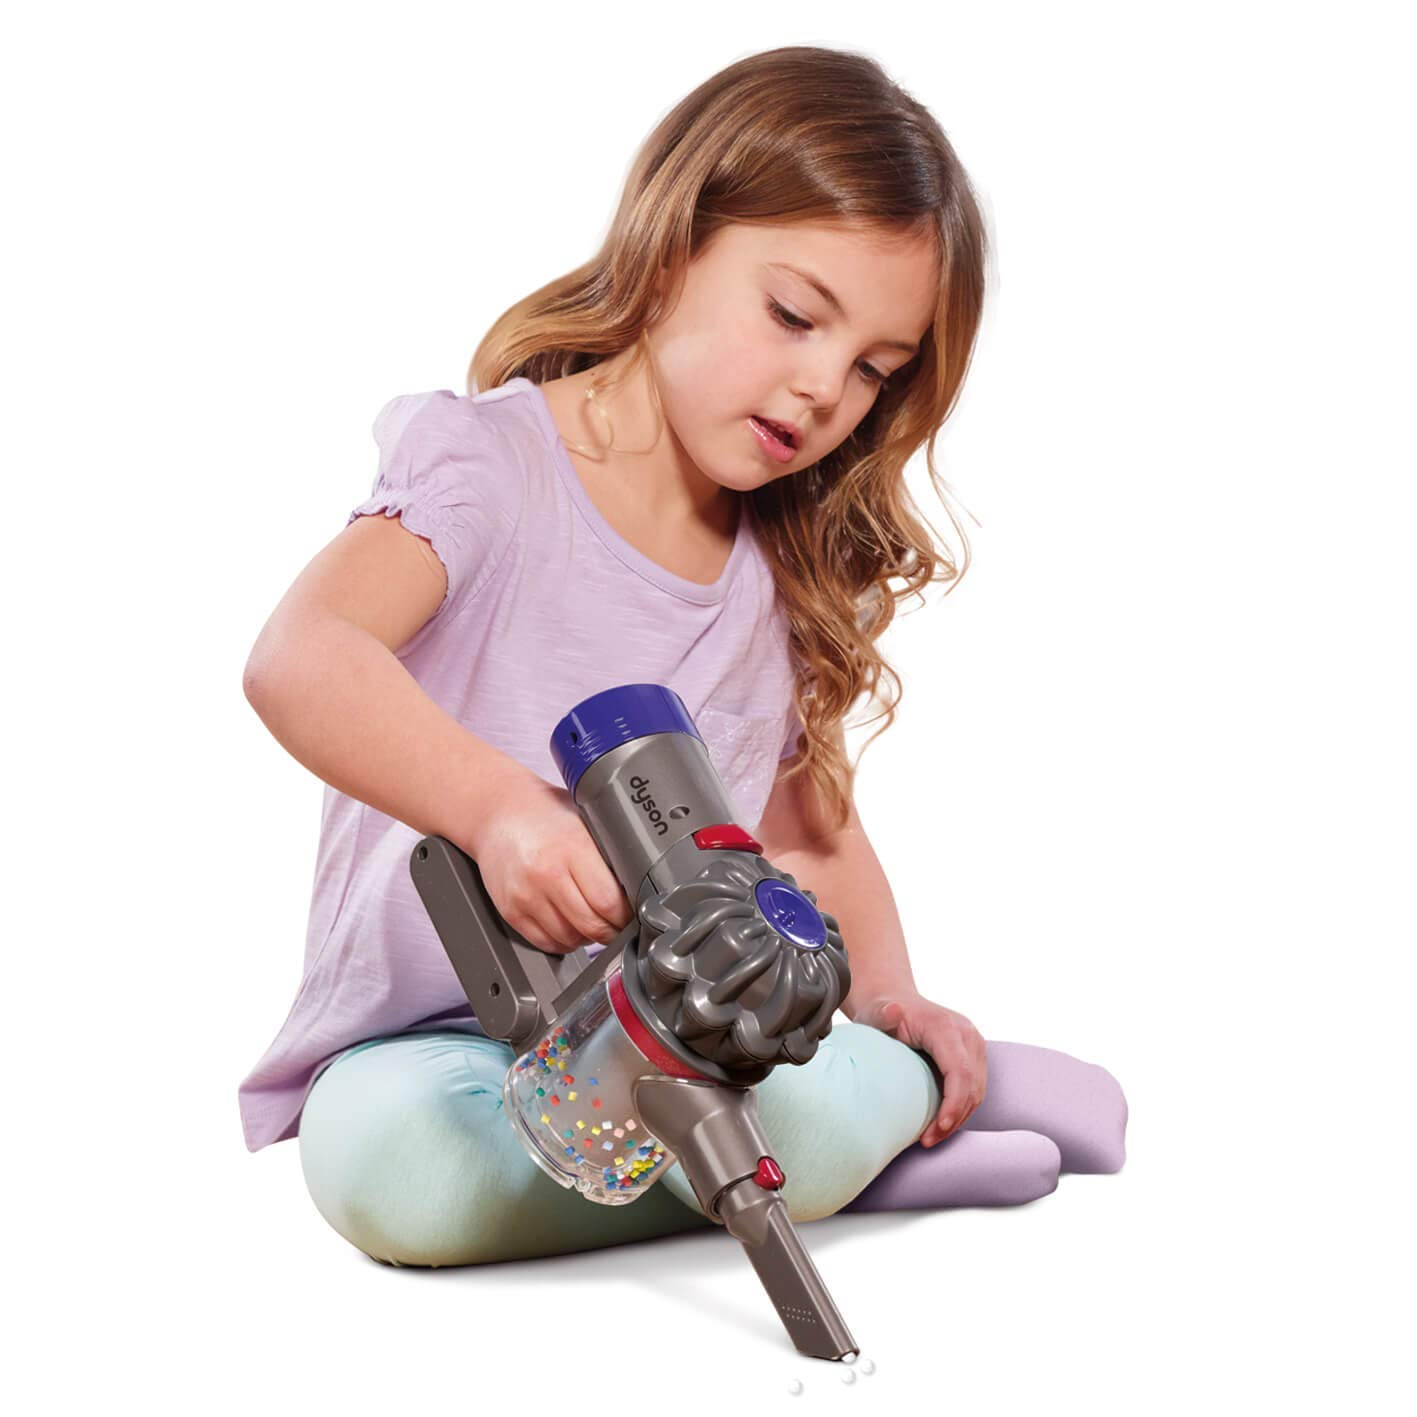 CASDON Little Helper Dyson 无绳手持式真空吸尘器玩具